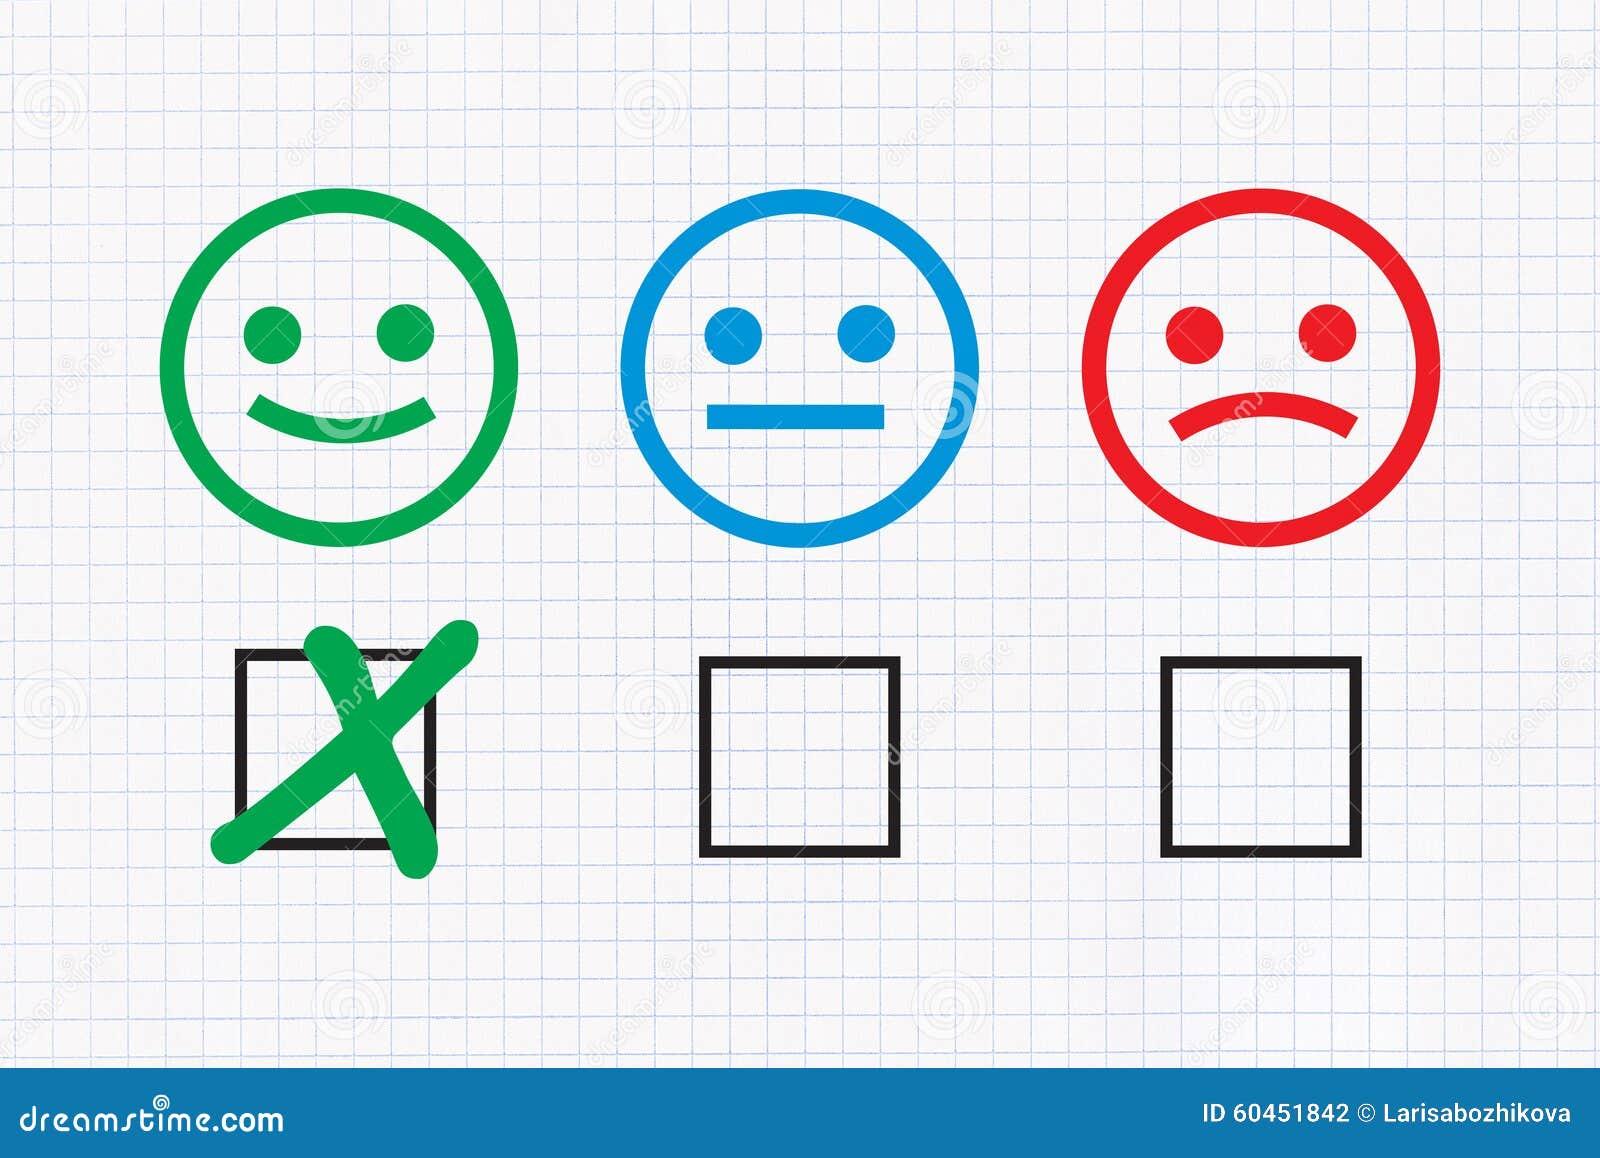 positive feedback stock illustration illustration of Lined Paper Clip Art graph paper clip art word